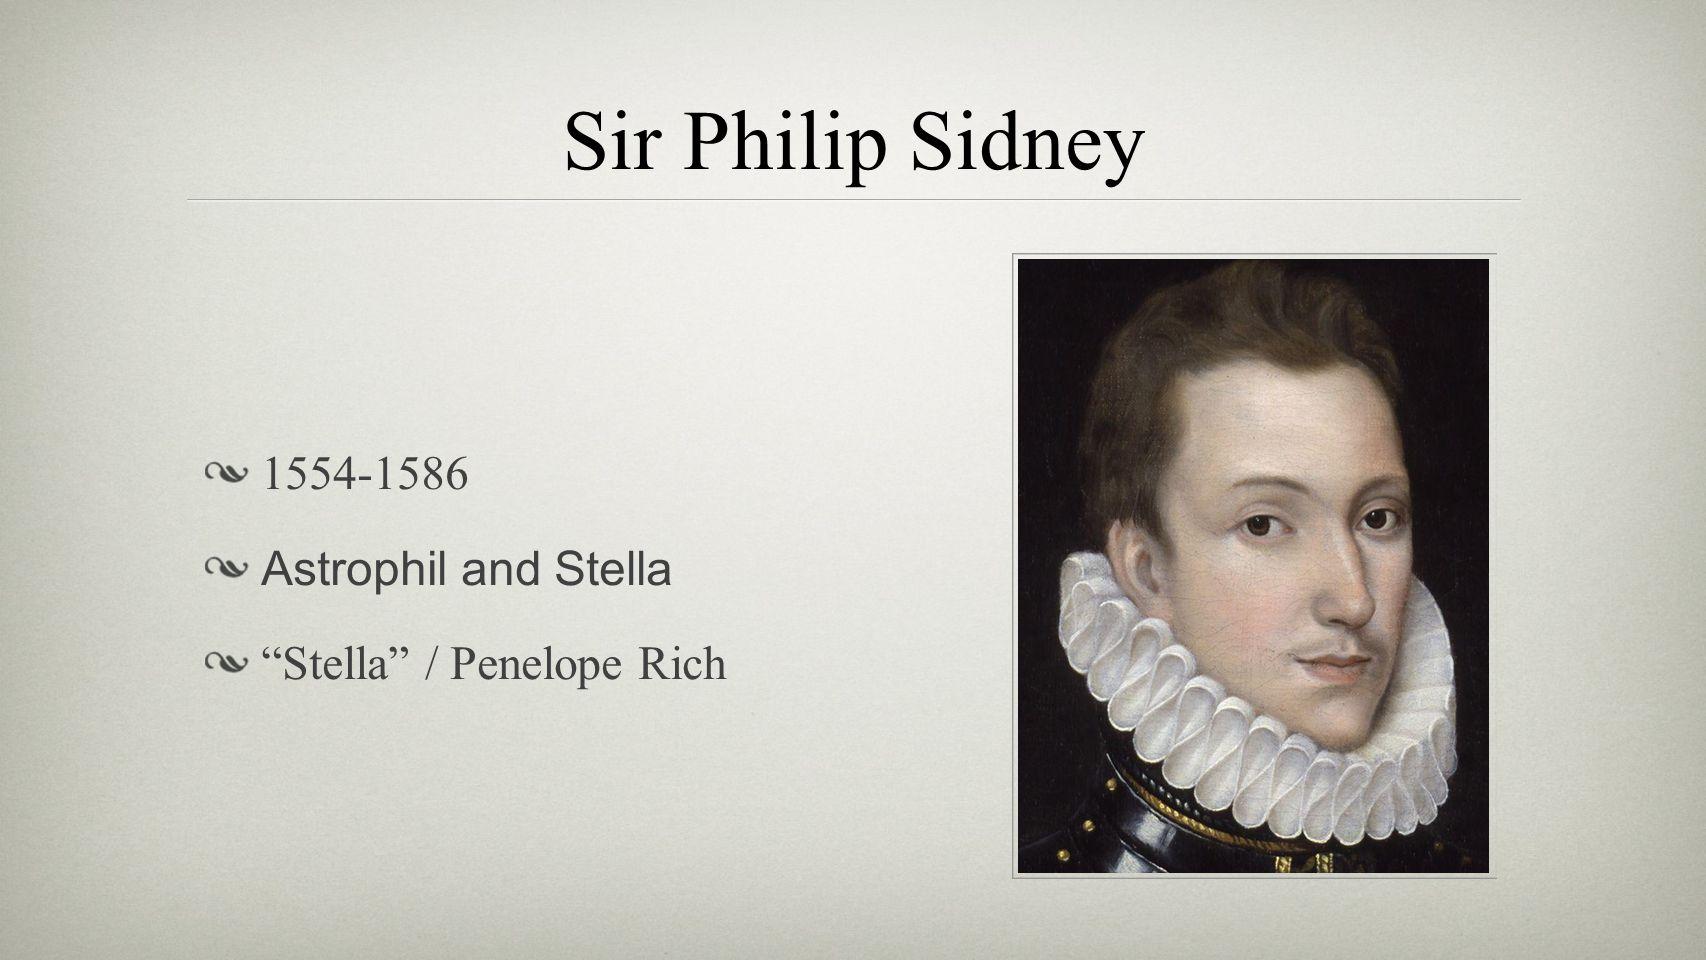 Sir Philip Sidney 1554-1586 Astrophil and Stella Stella / Penelope Rich